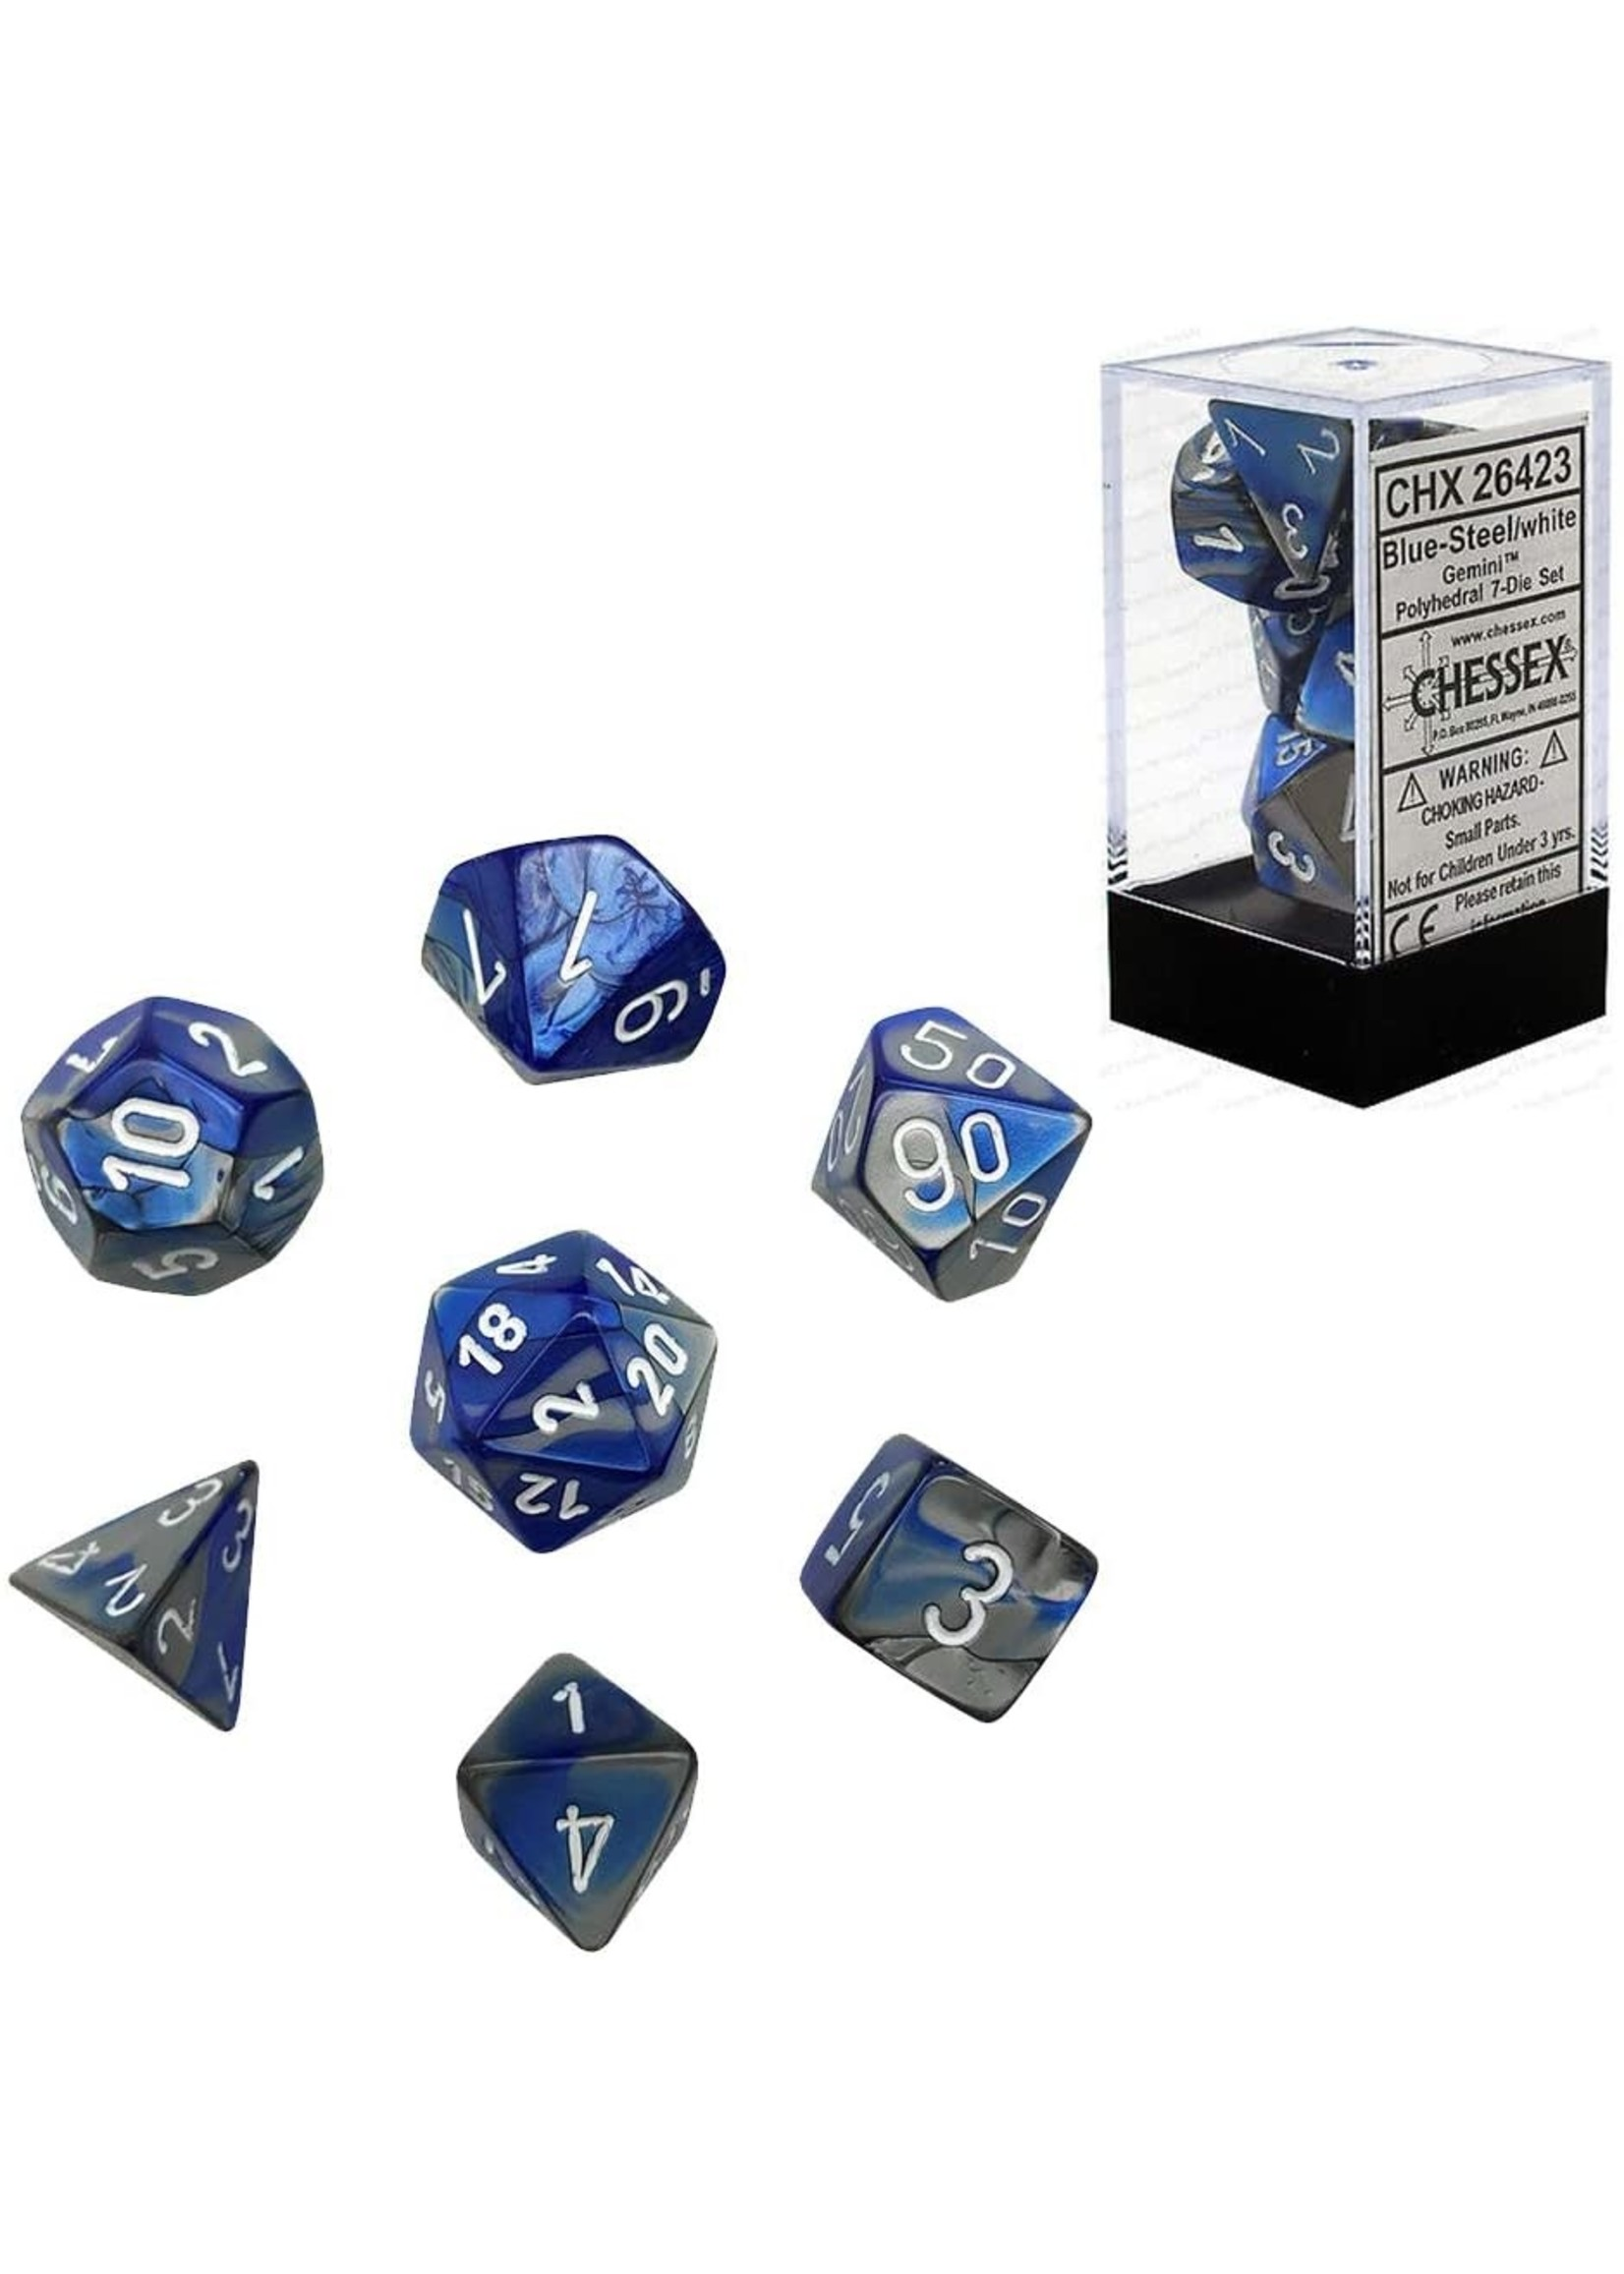 Chessex Gemini Poly 7 set: Blue & Steel w/ White